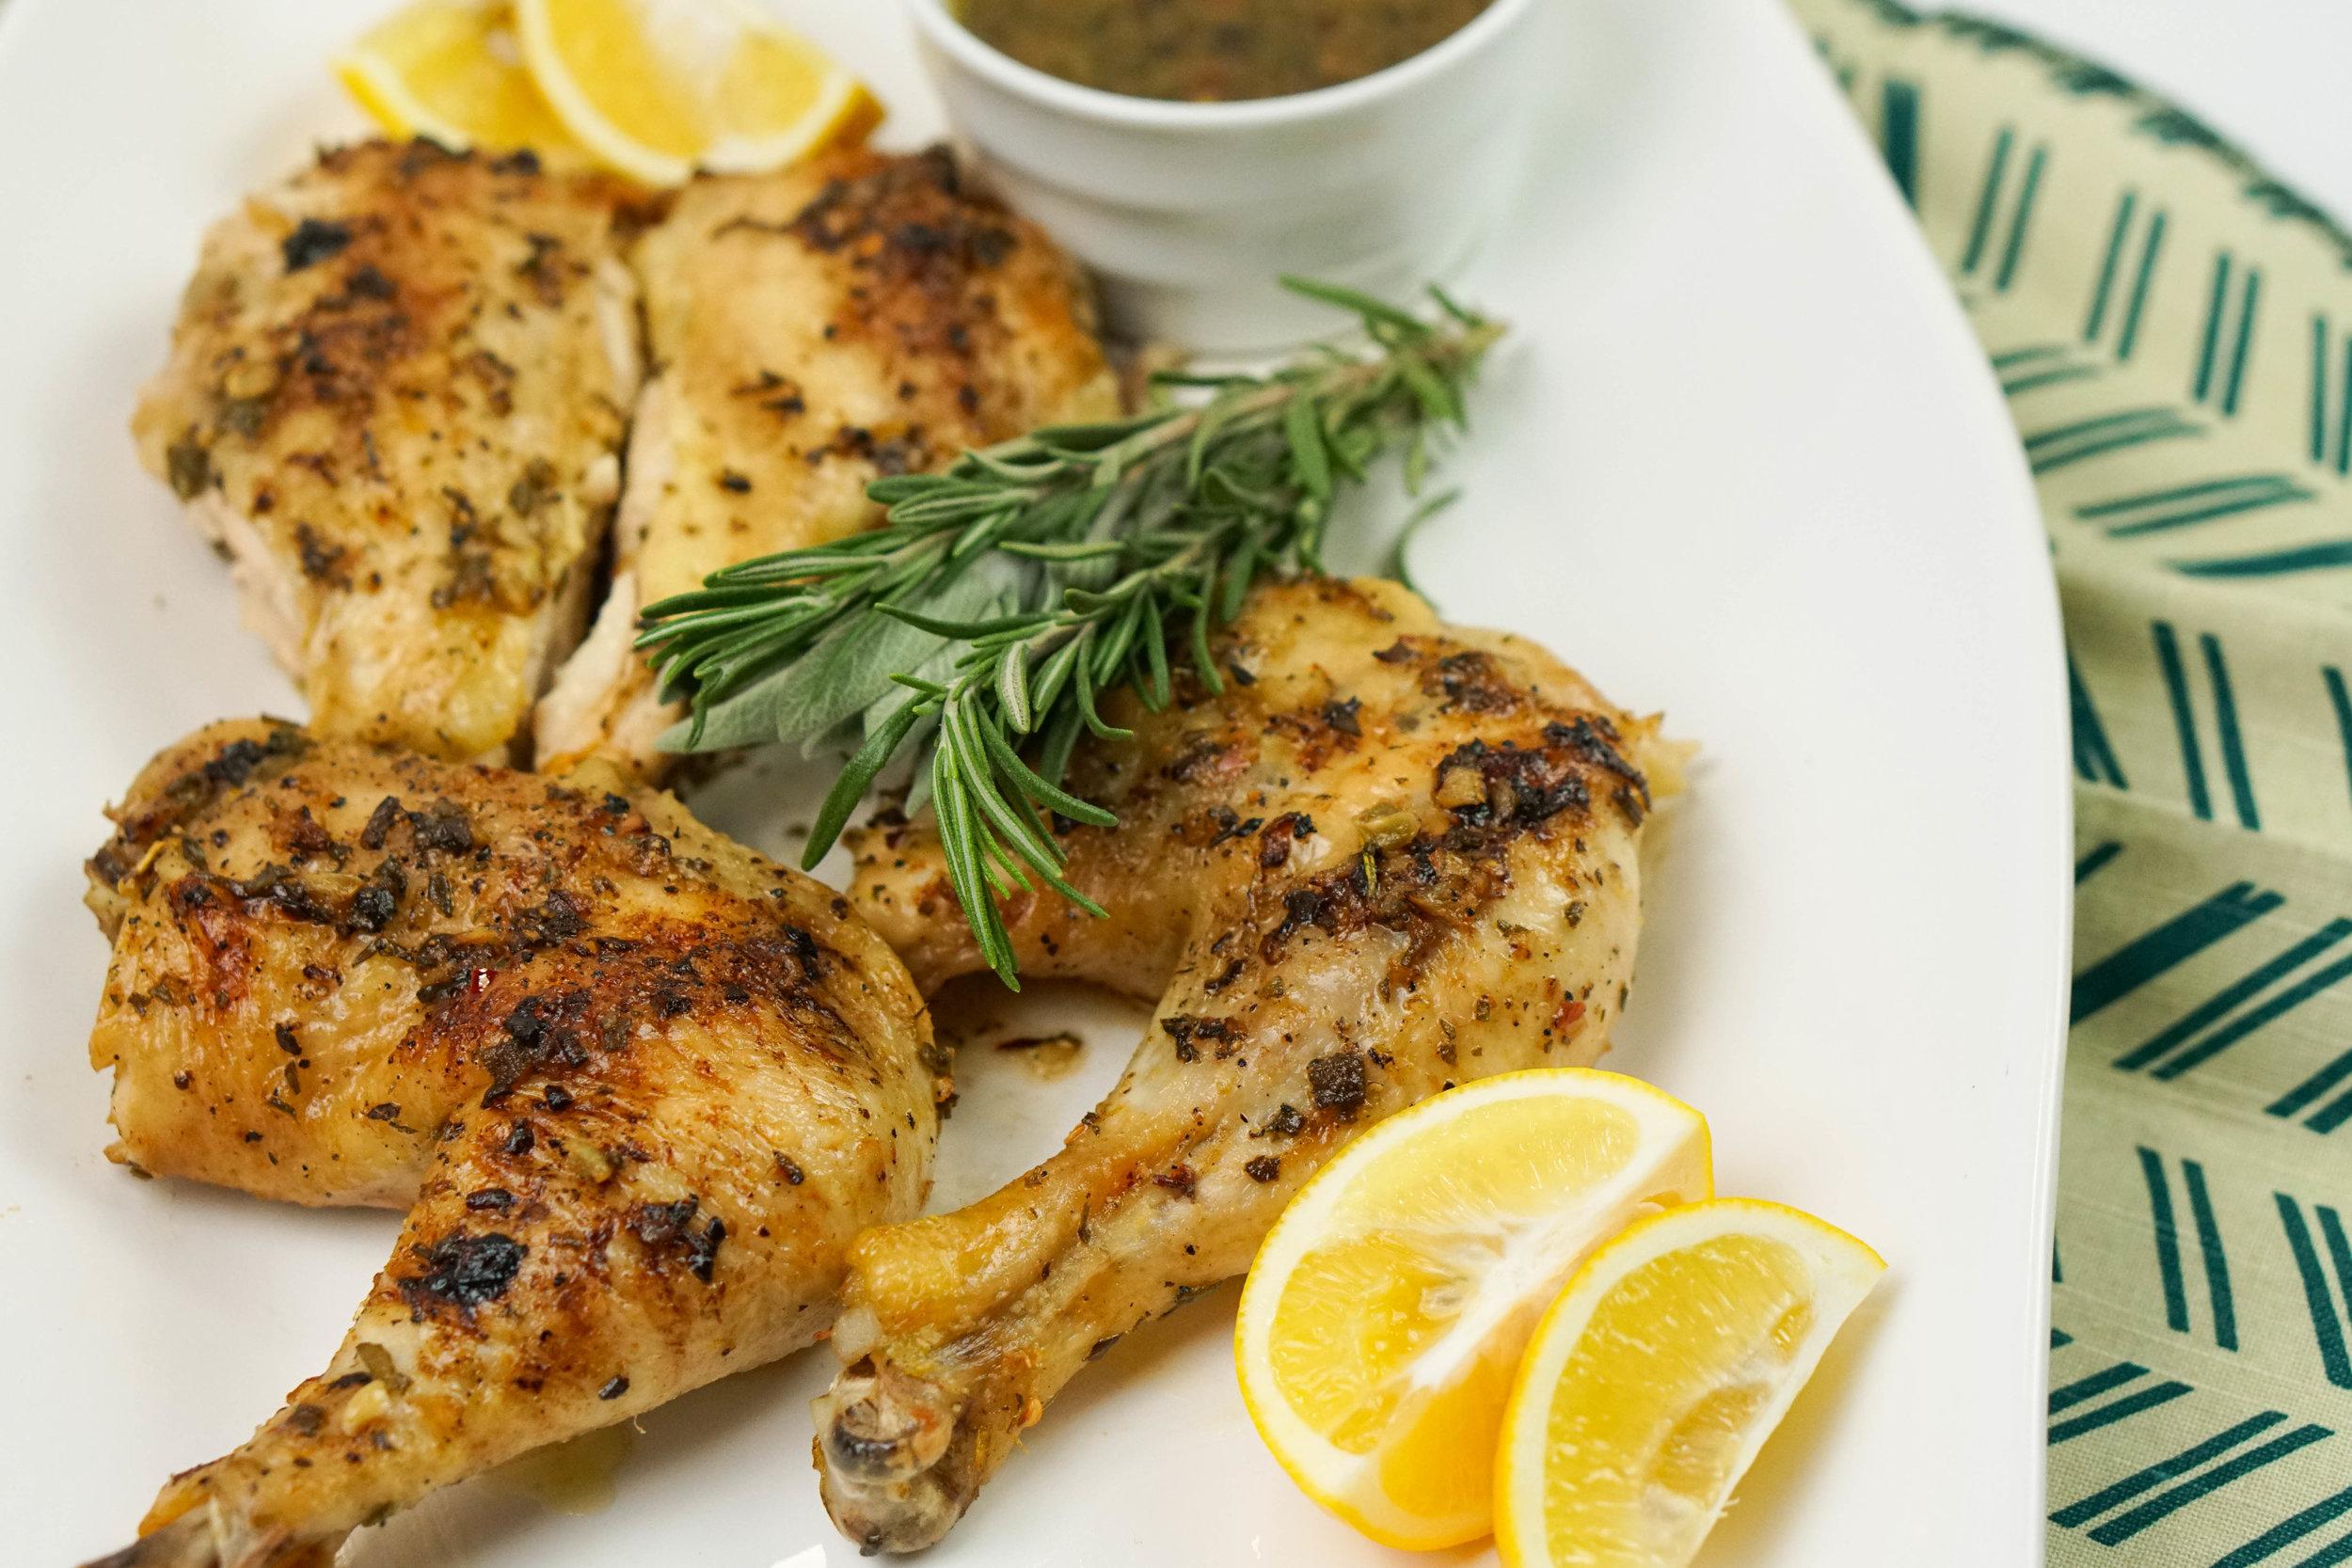 meyer_lemon_chicken.jpg